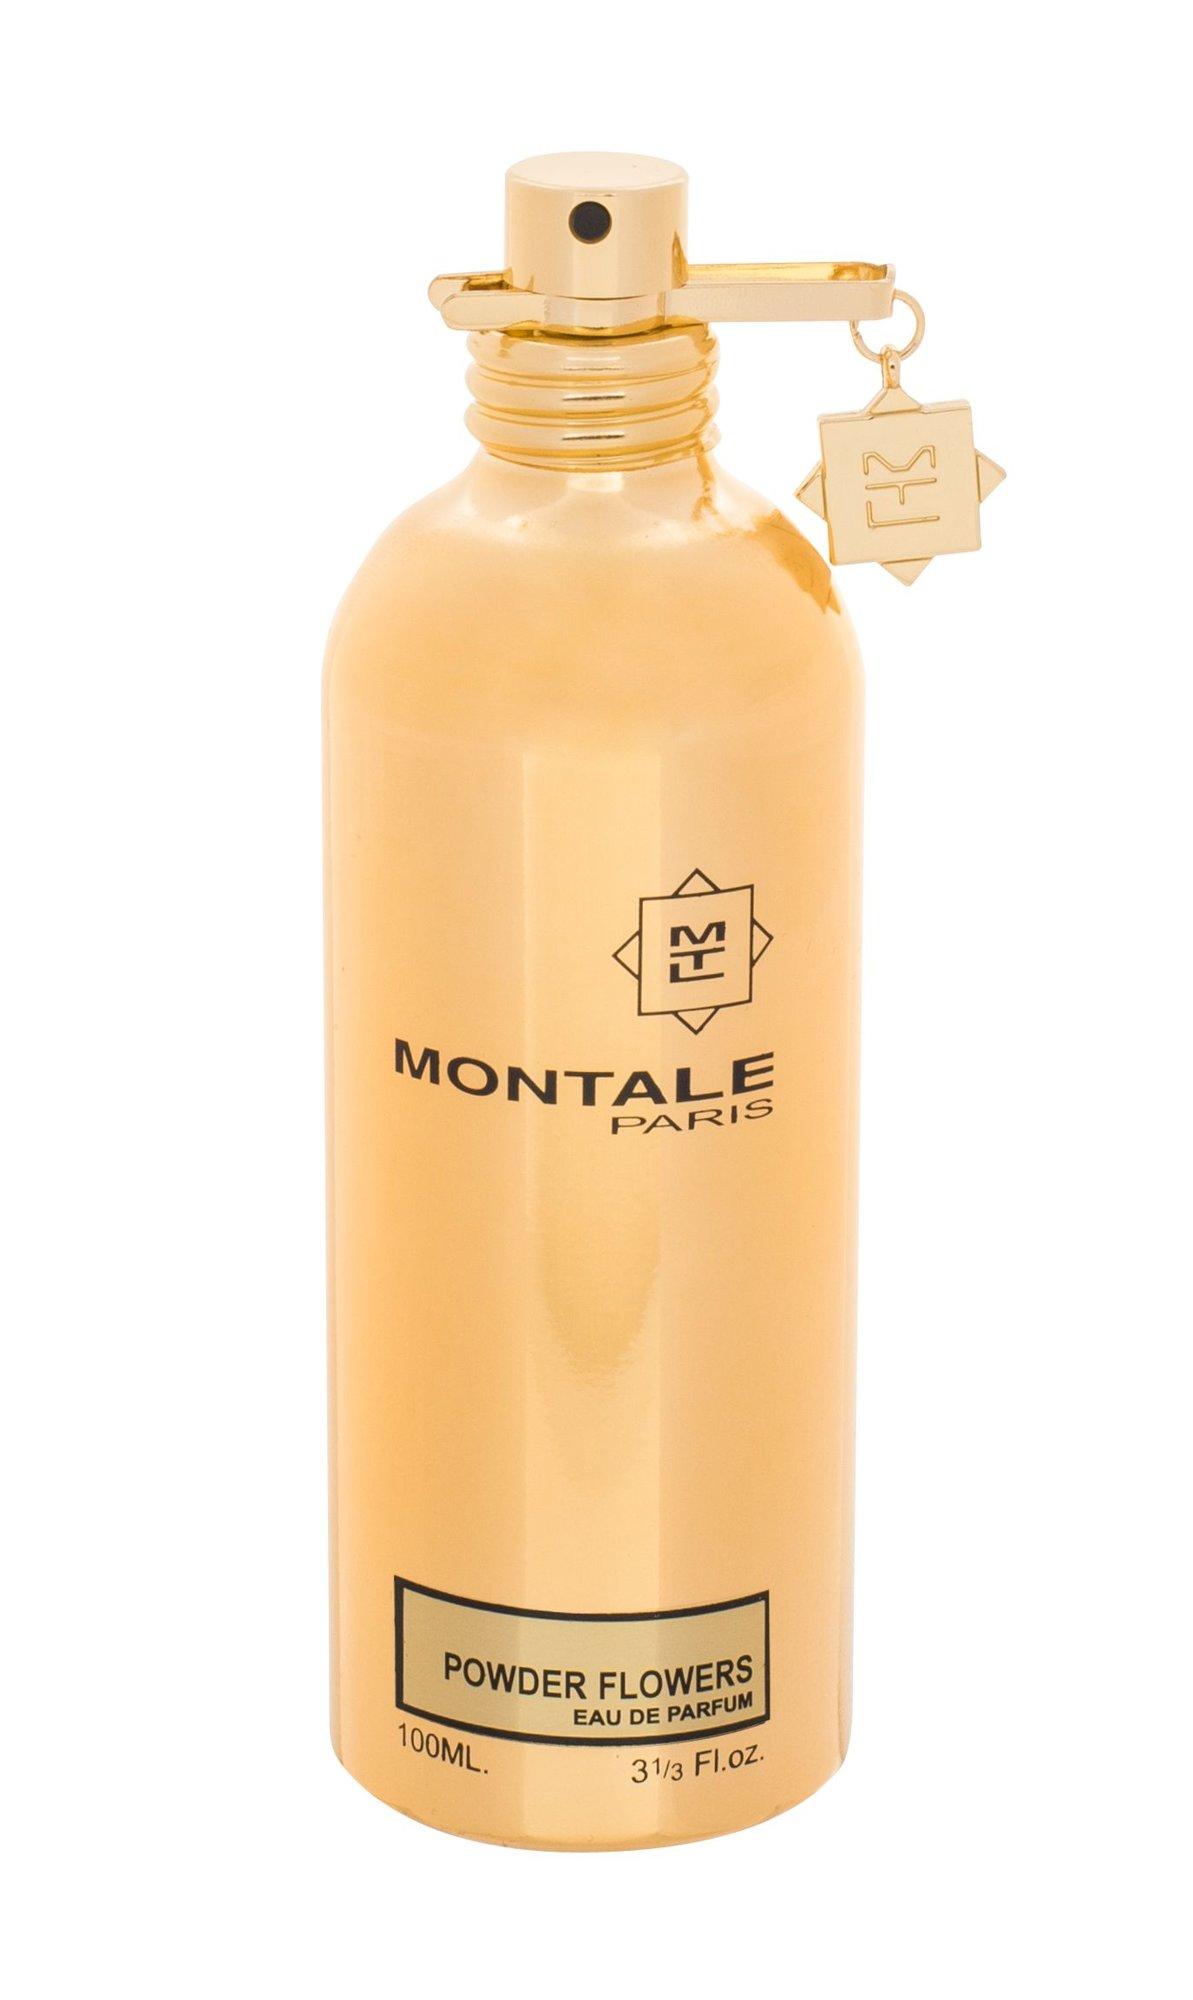 Montale Paris Powder Flowers EDP 100ml